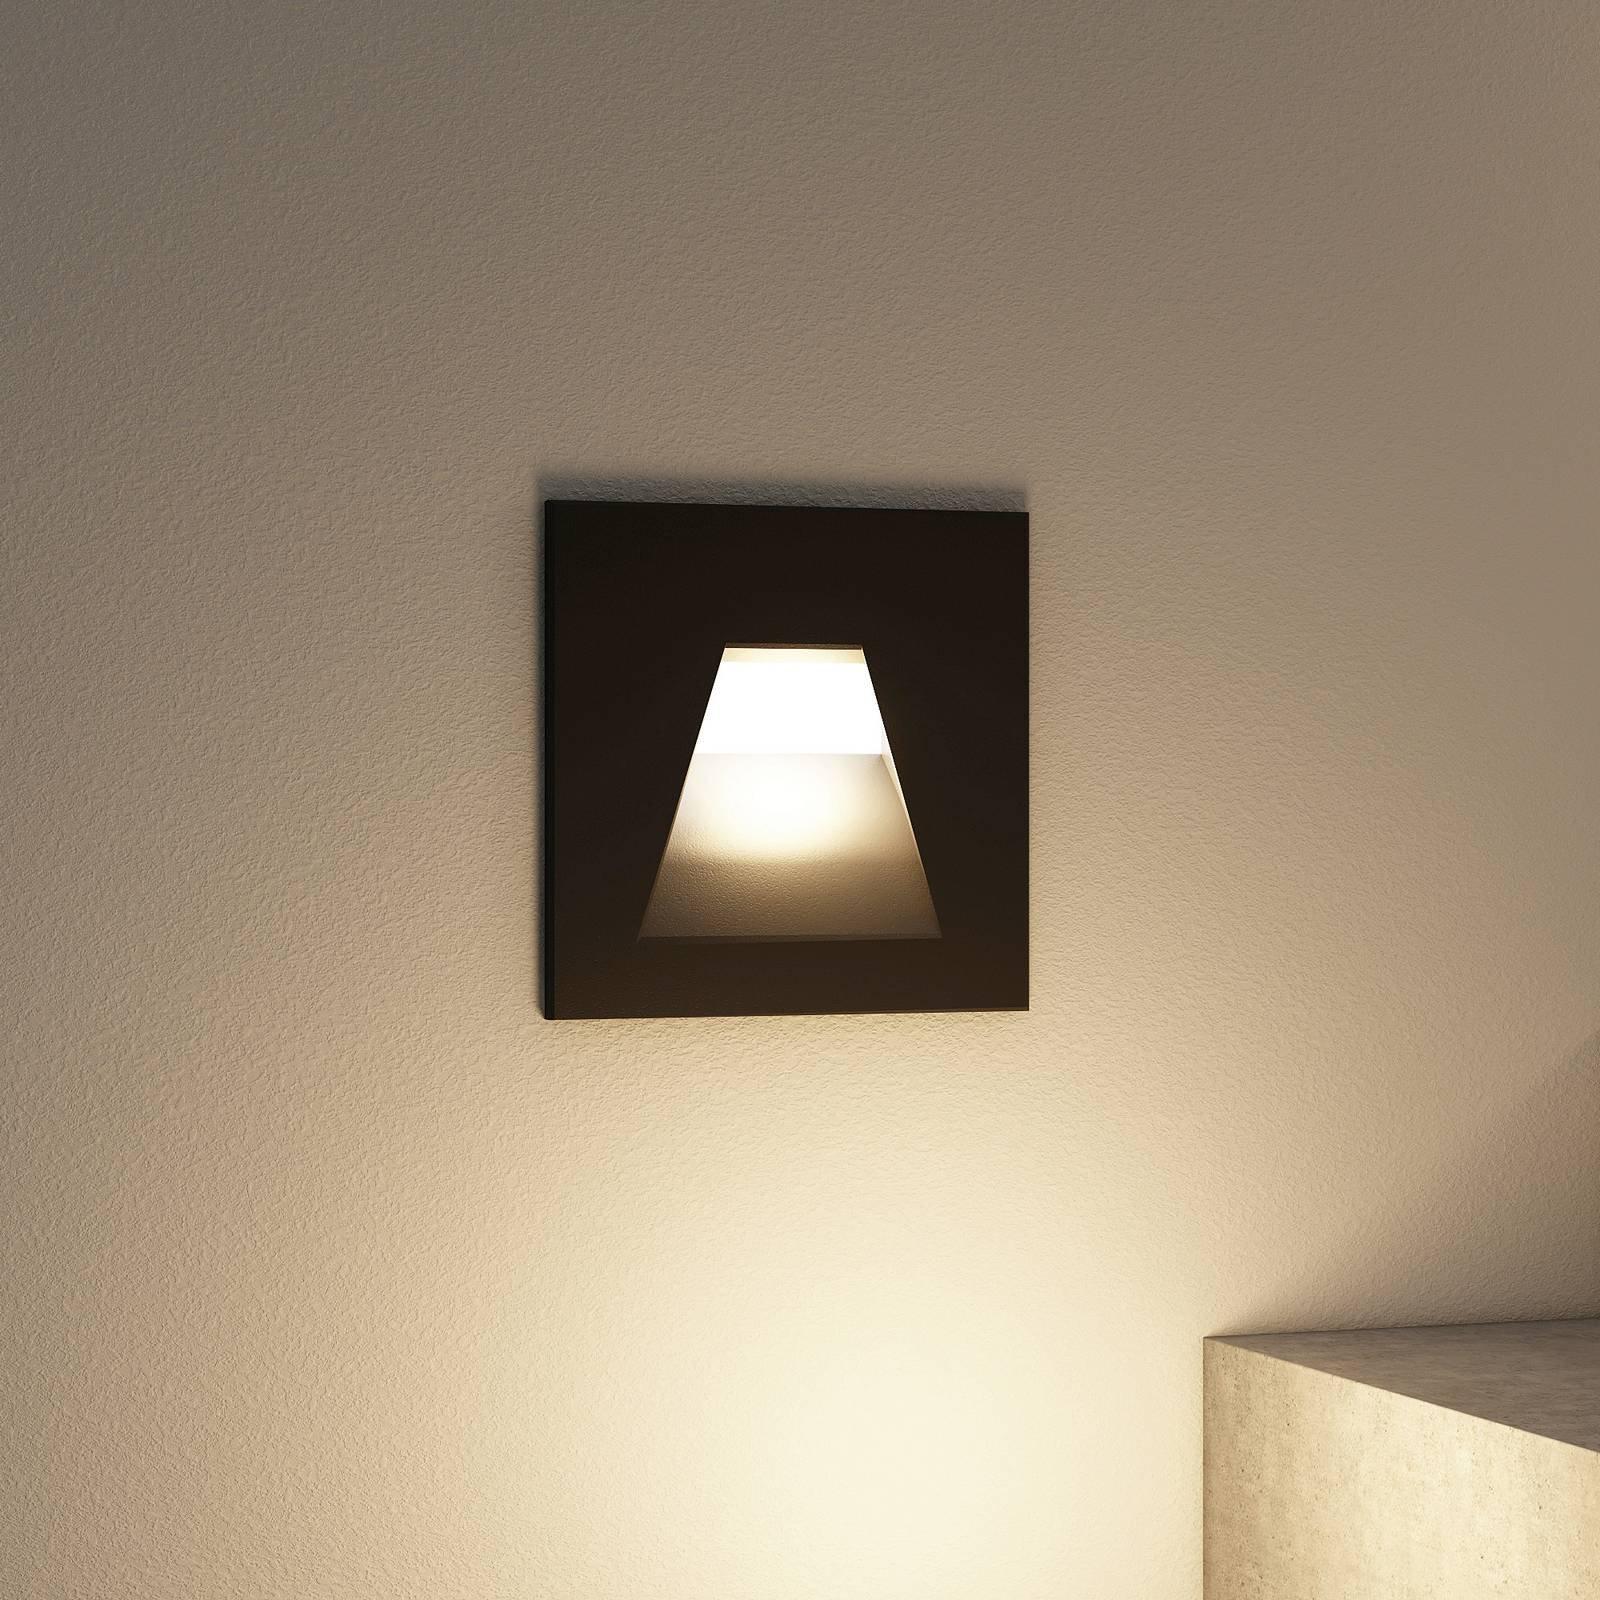 Arcchio Lasca LED-innfellingslampe, svart